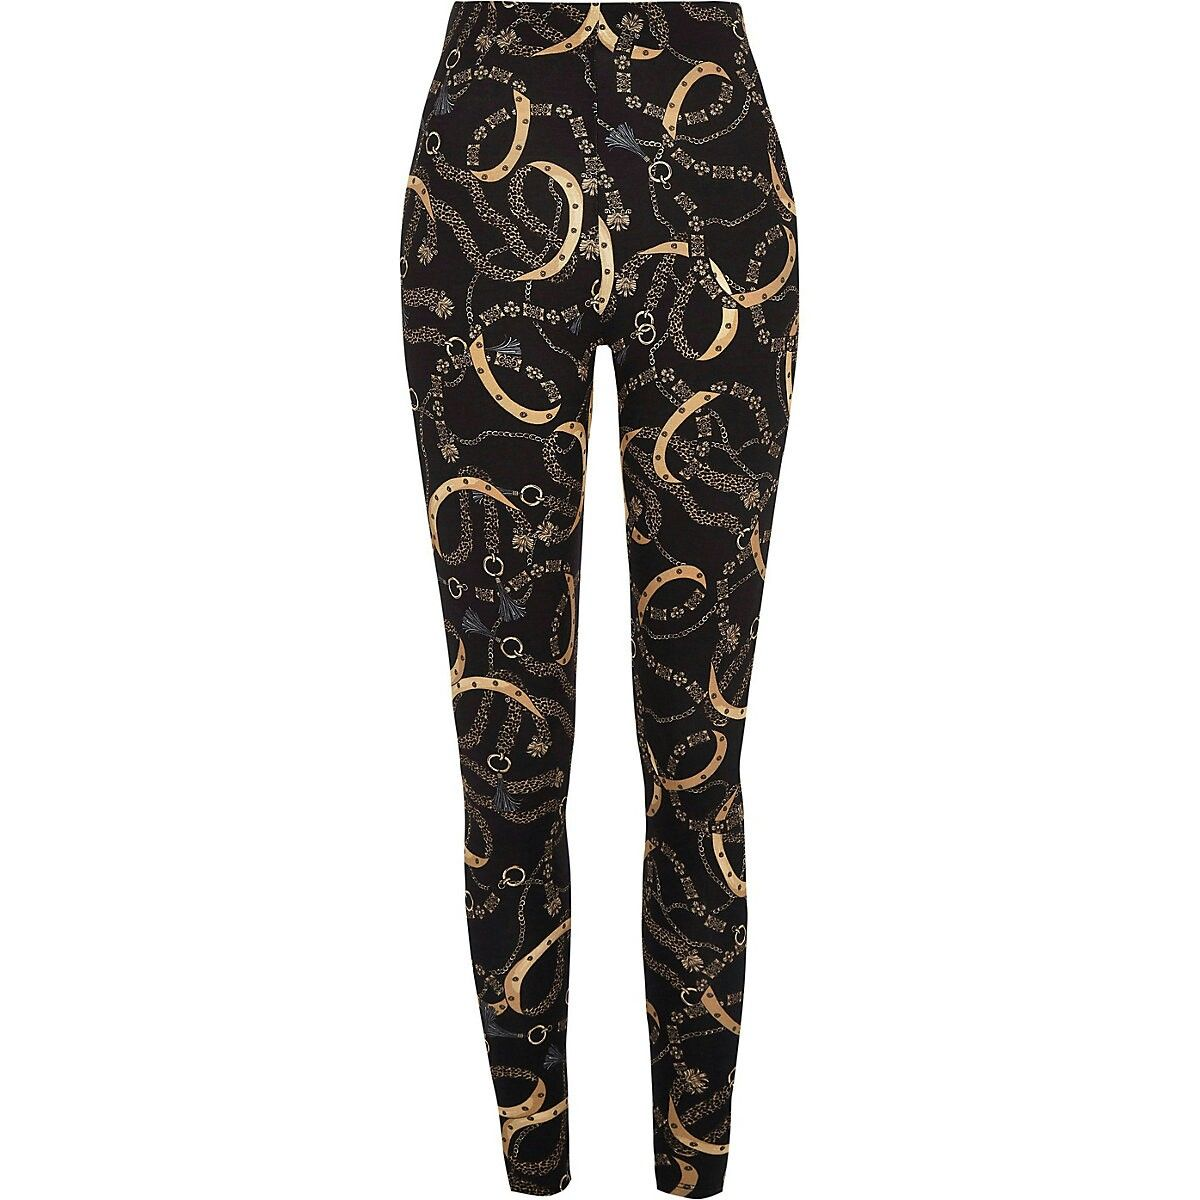 a441ab8a07 Black chain print leggings   Leggings in 2019   Printed leggings ...